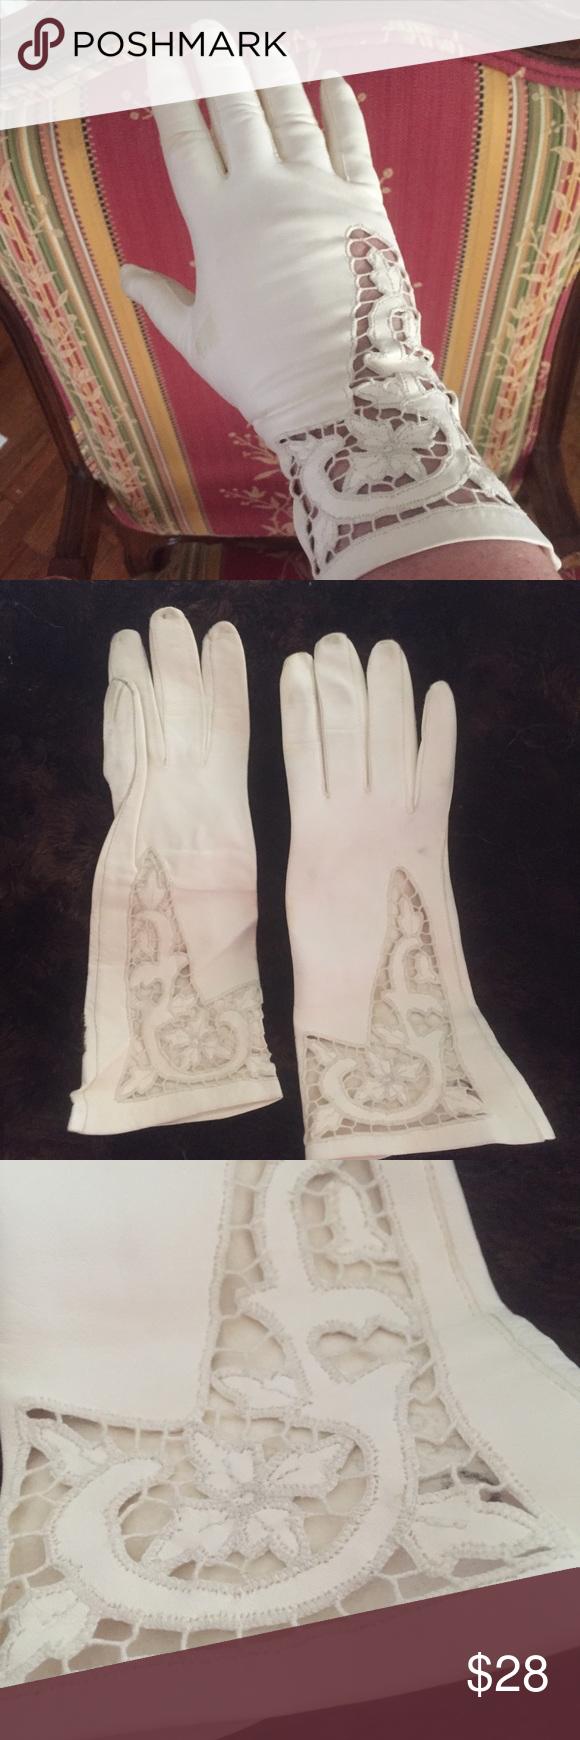 Ladies long vintage leather gloves - Vintage Ladies Leather Gloves W Laser Cut Lace